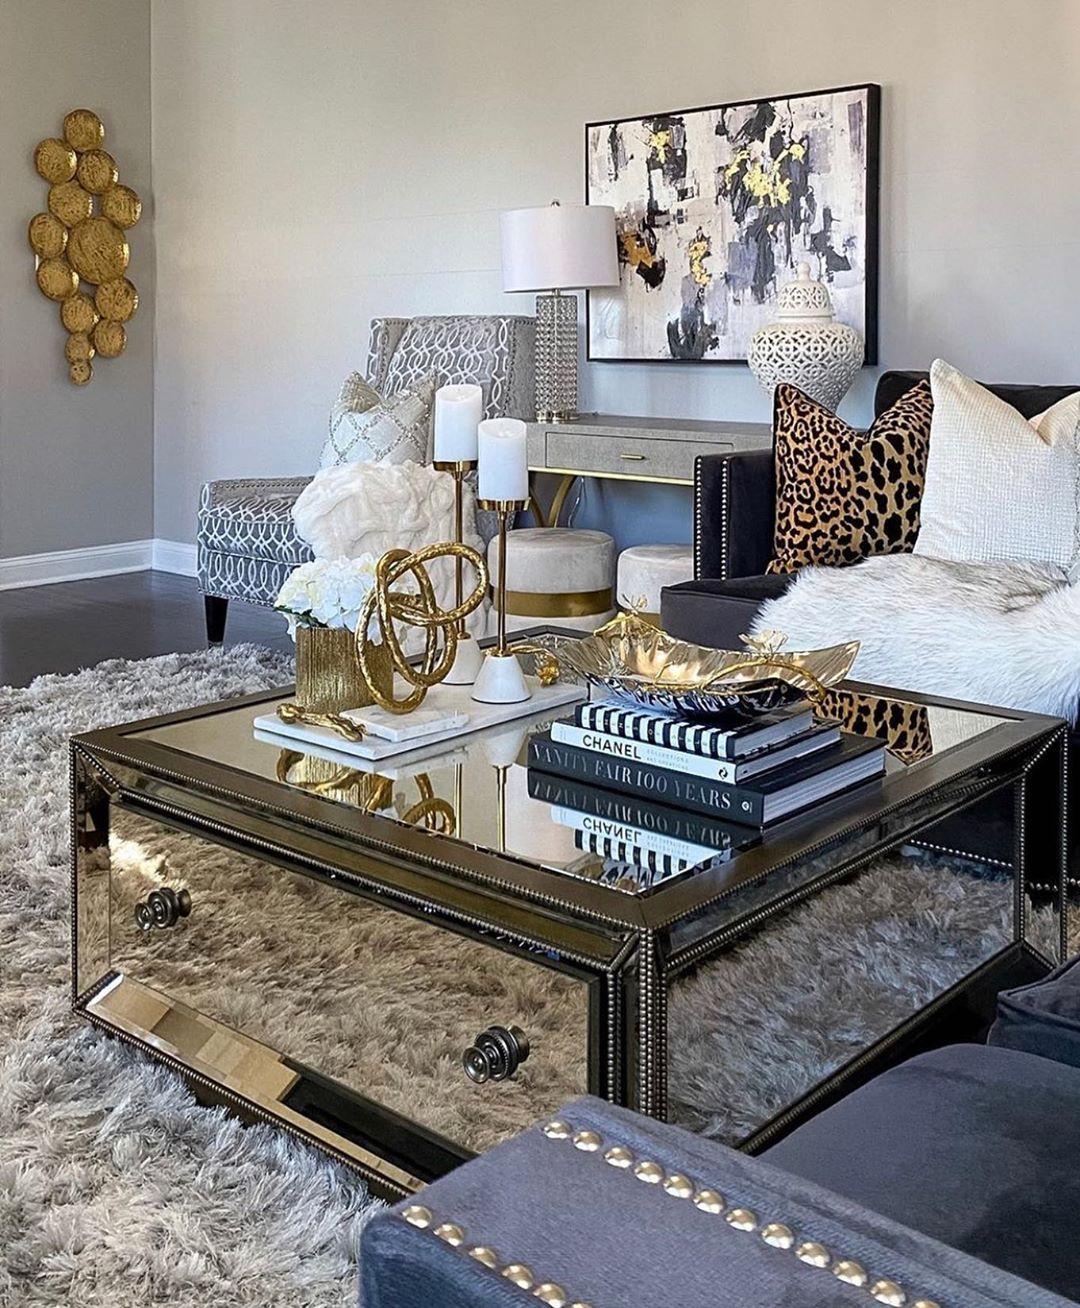 "Coco Furniture Gallery on Instagram: ""Coffee table gem 💎📲 305-600-7776! - @mojisstyle 😍😍✨ #realtor #realestatemiami #love #midtownmiami #interiordesign #southflorida…"""